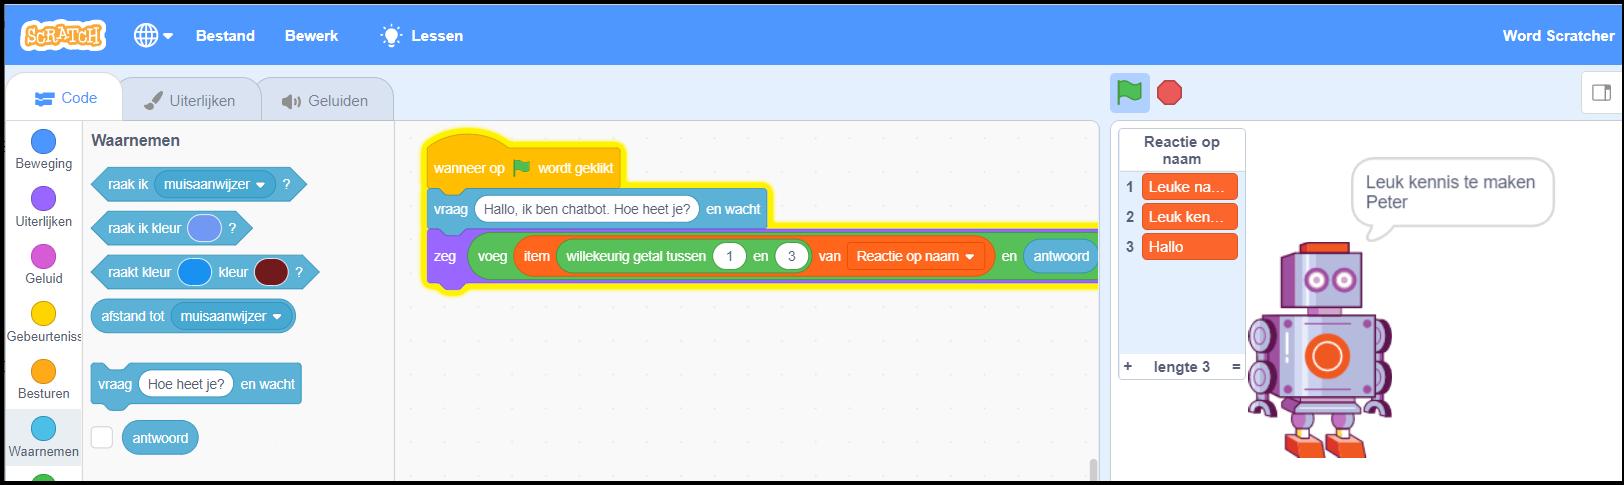 Scratch Chatbot afbeelding 6a